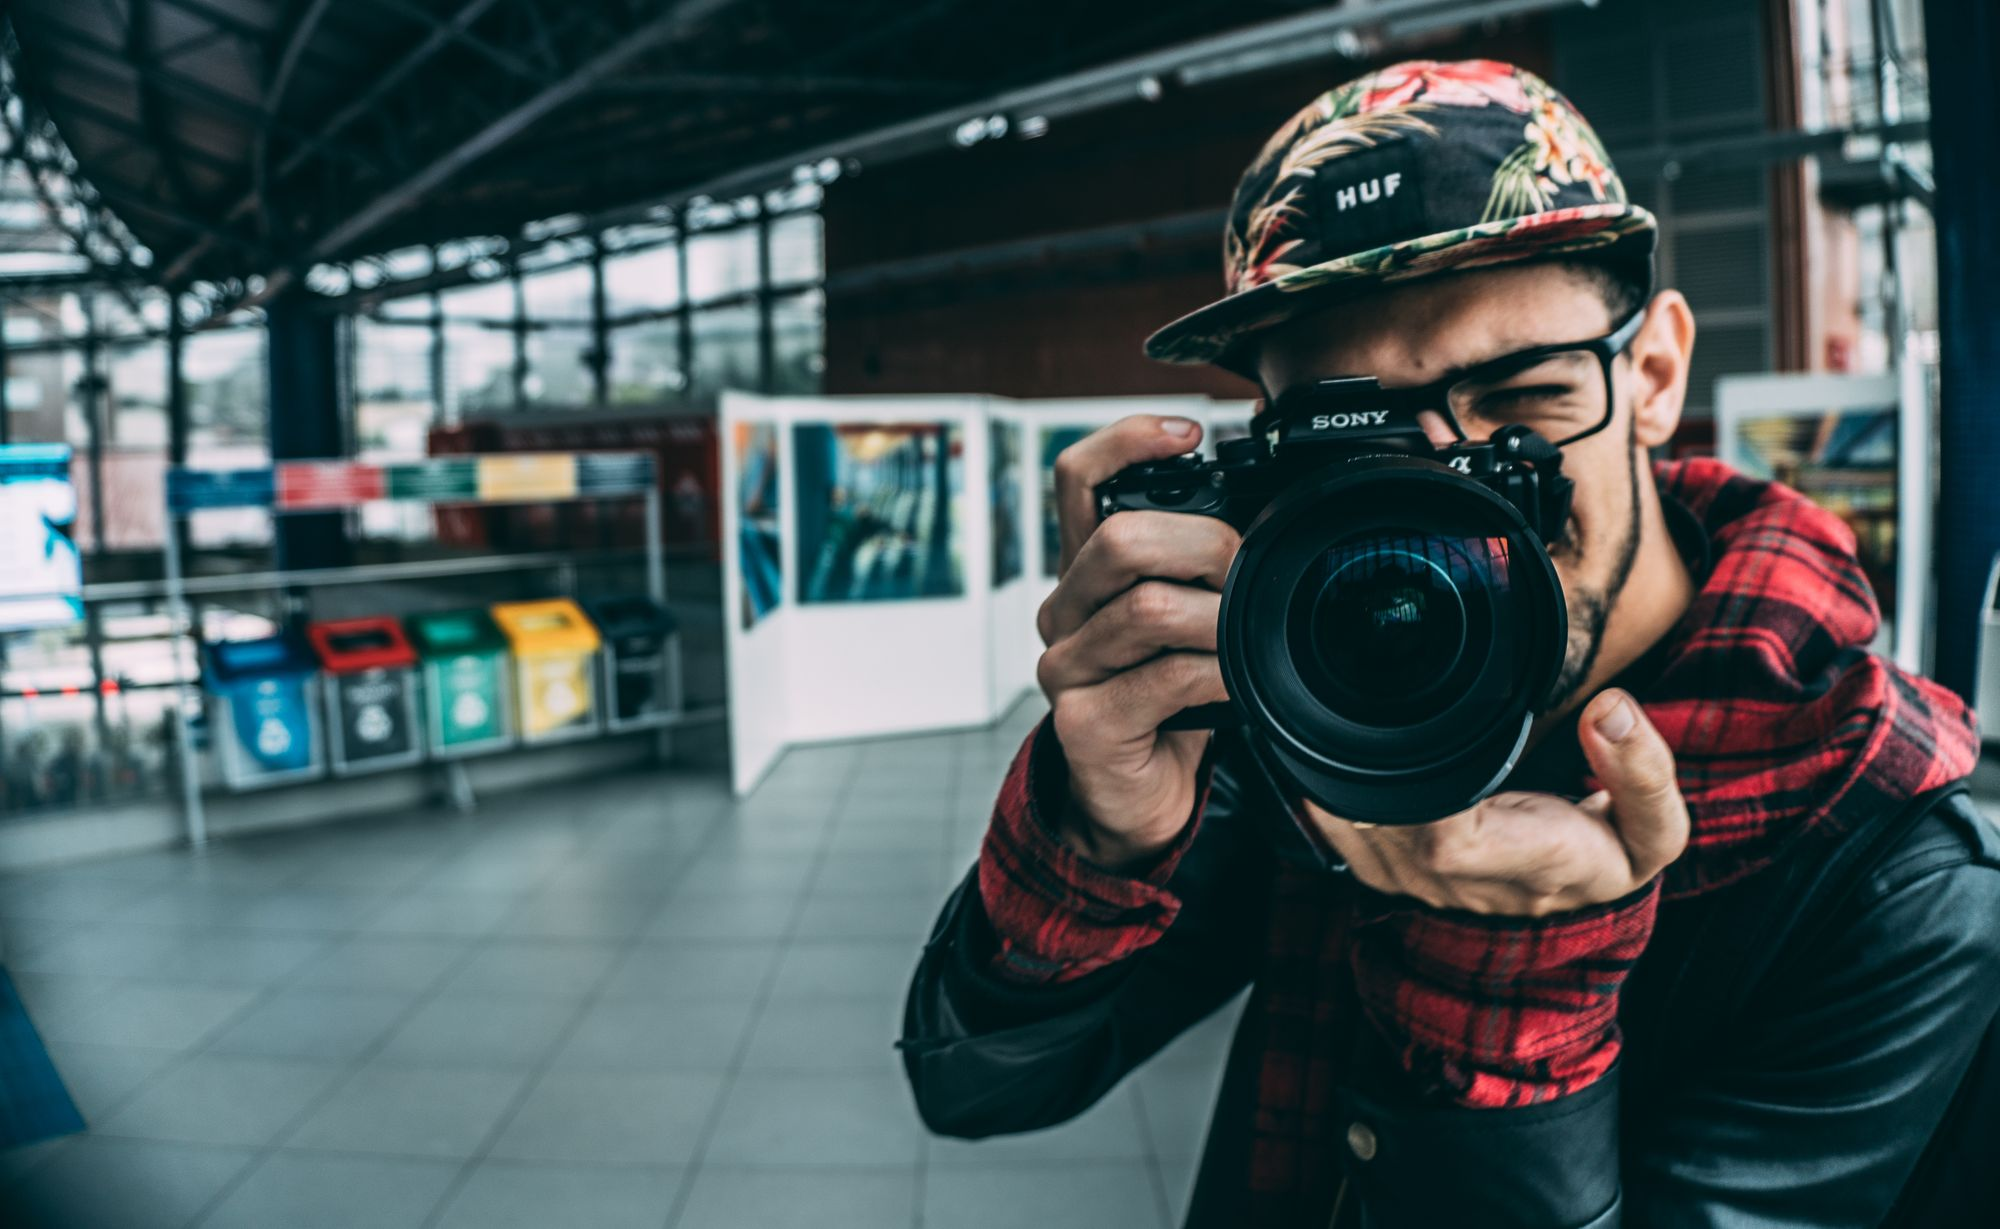 Privacyproblemen rond foto's